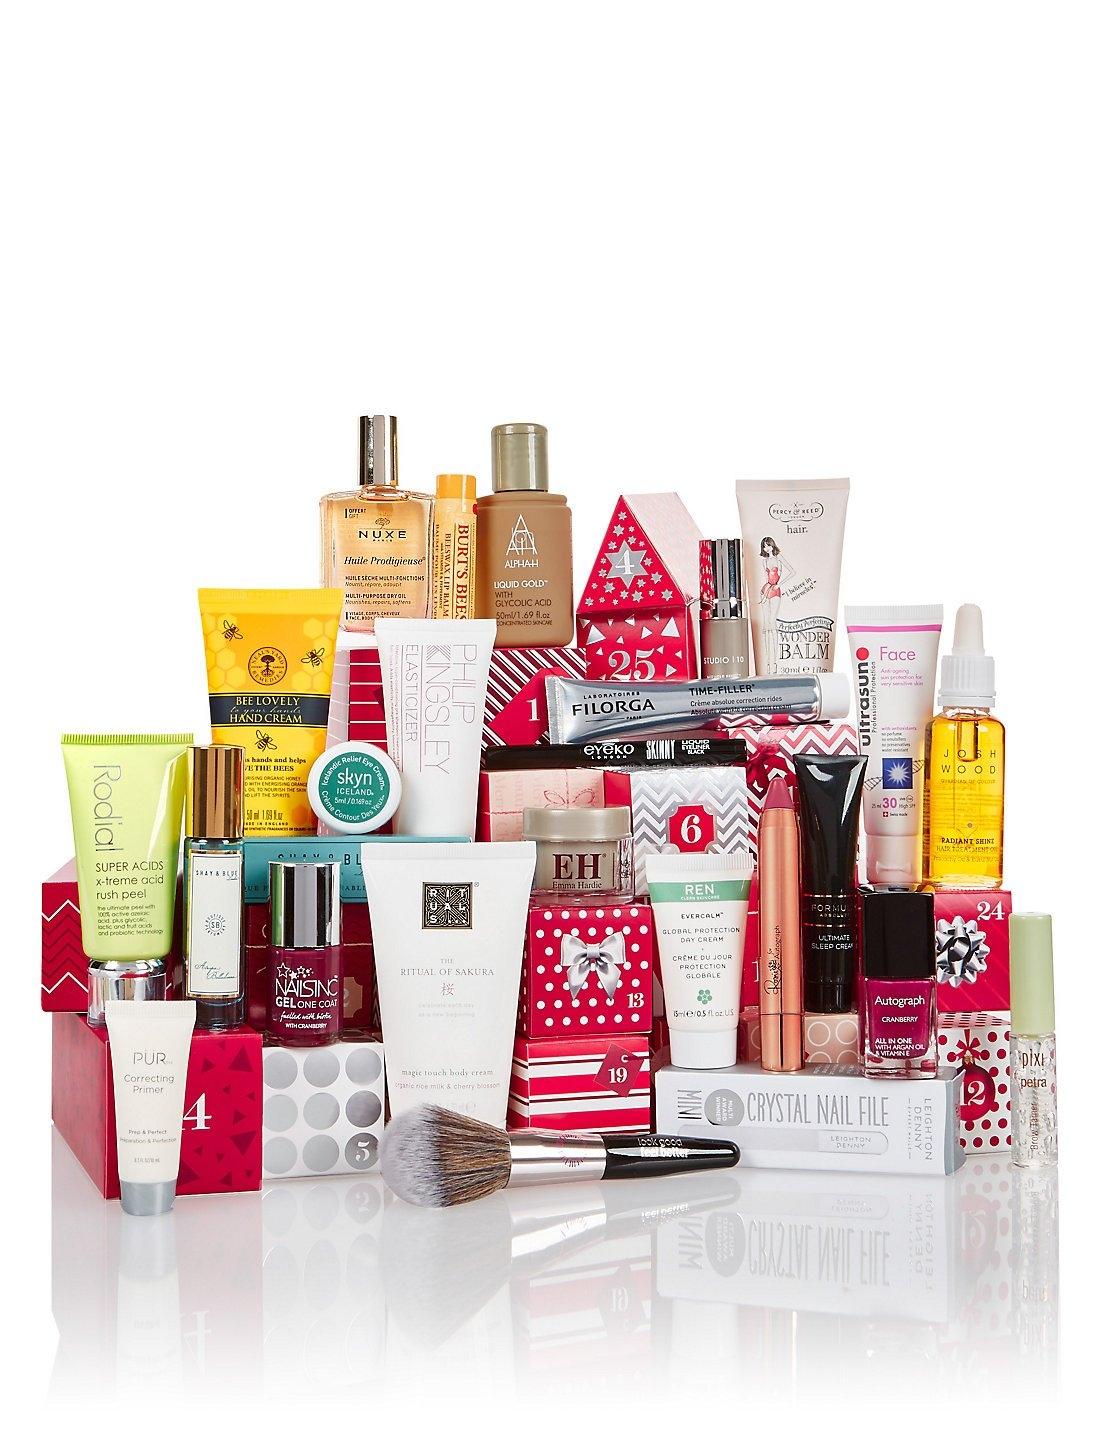 M&s Beauty Advent Calendar - £35 When You Spend £35+ | 2019 Diy How M&s Calendar 2019